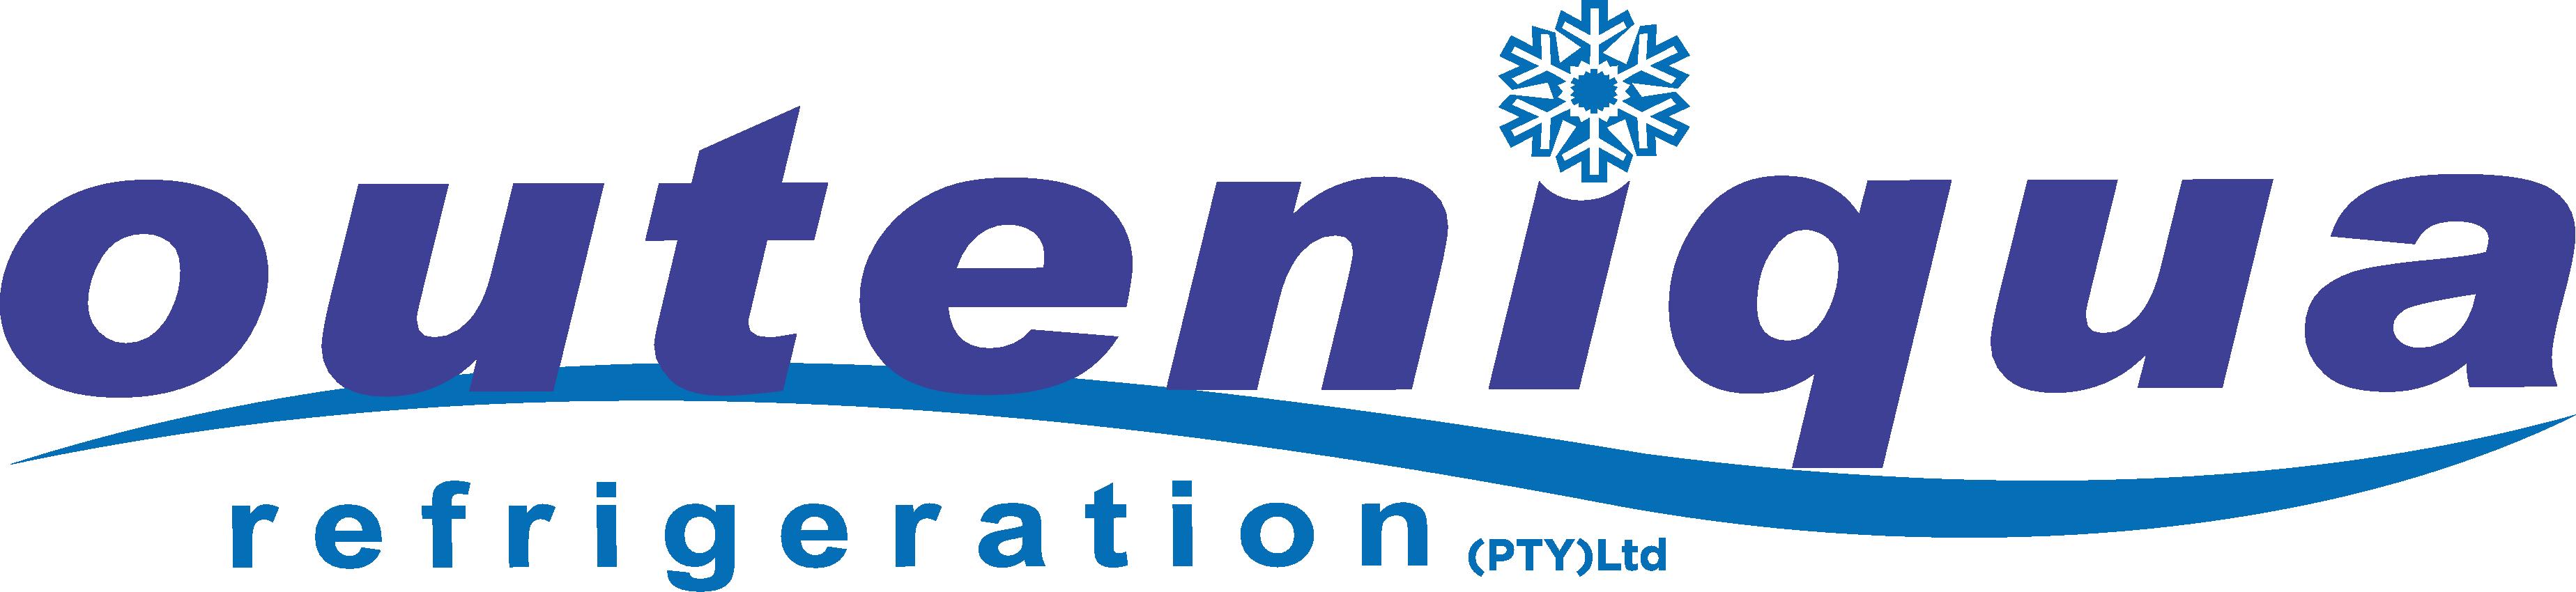 Outeniqua Refrigeration